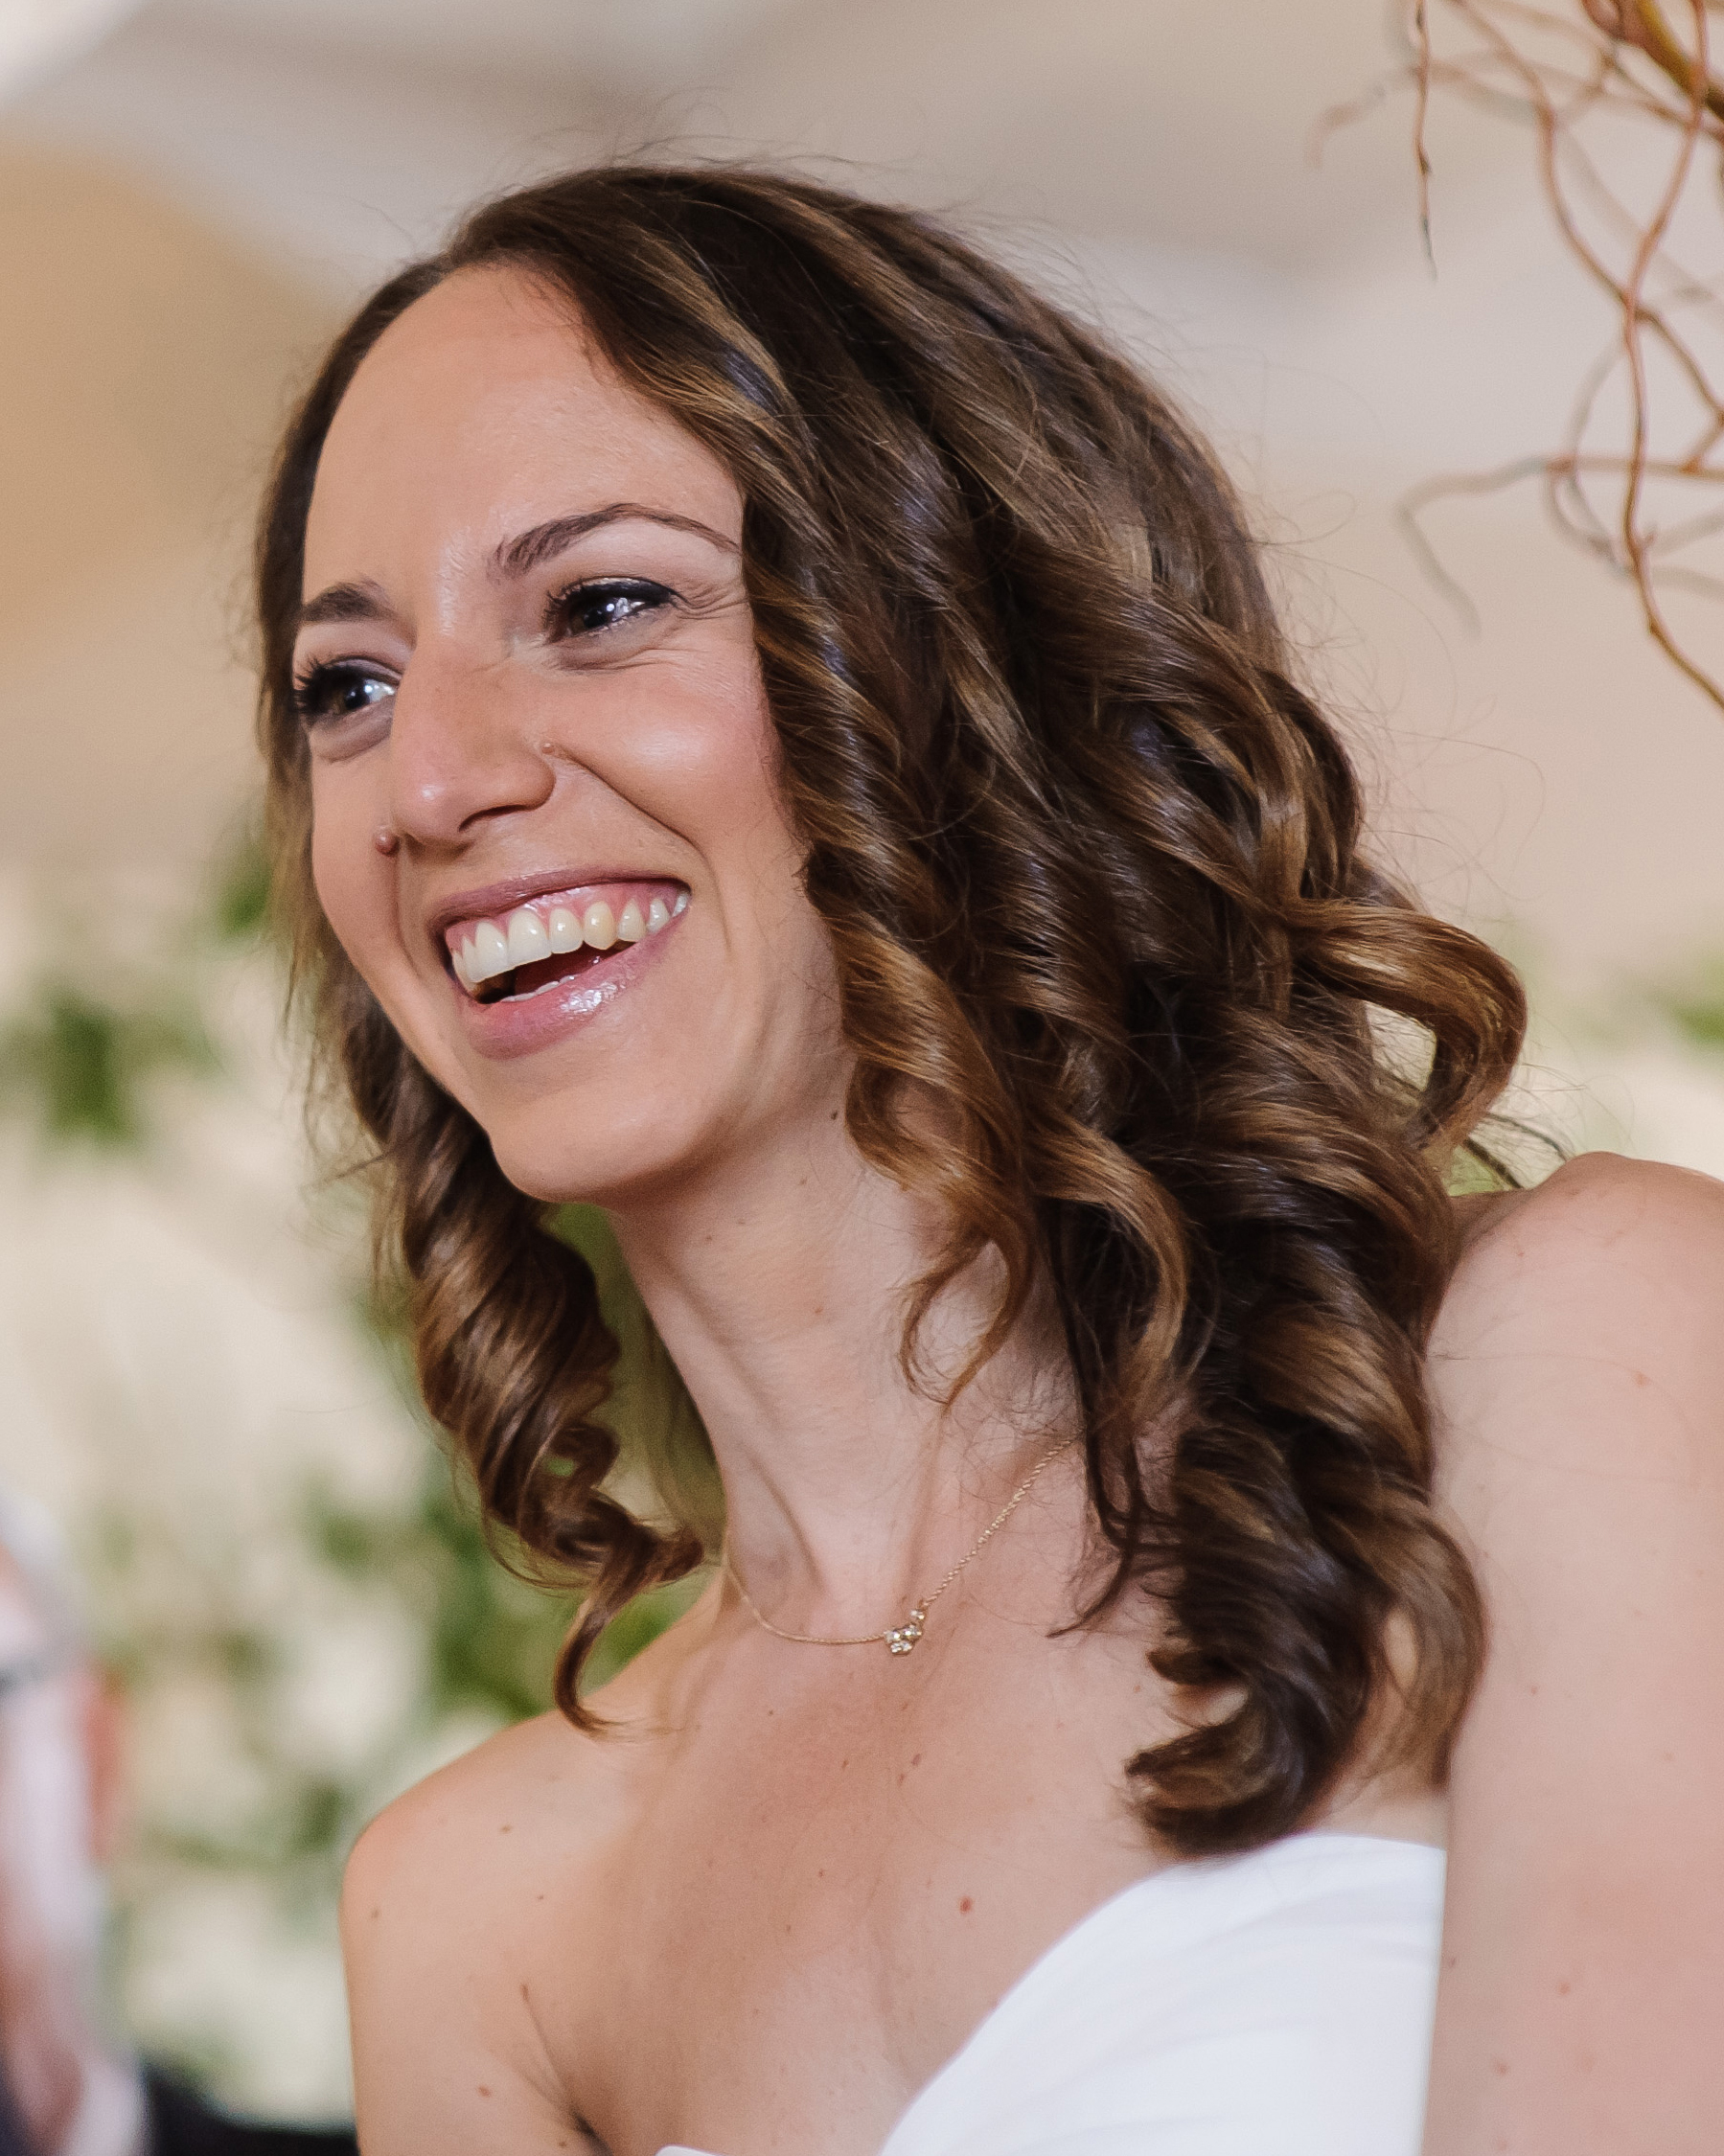 editor-wedding-beauty-looks-brooke-porter-0915.jpg